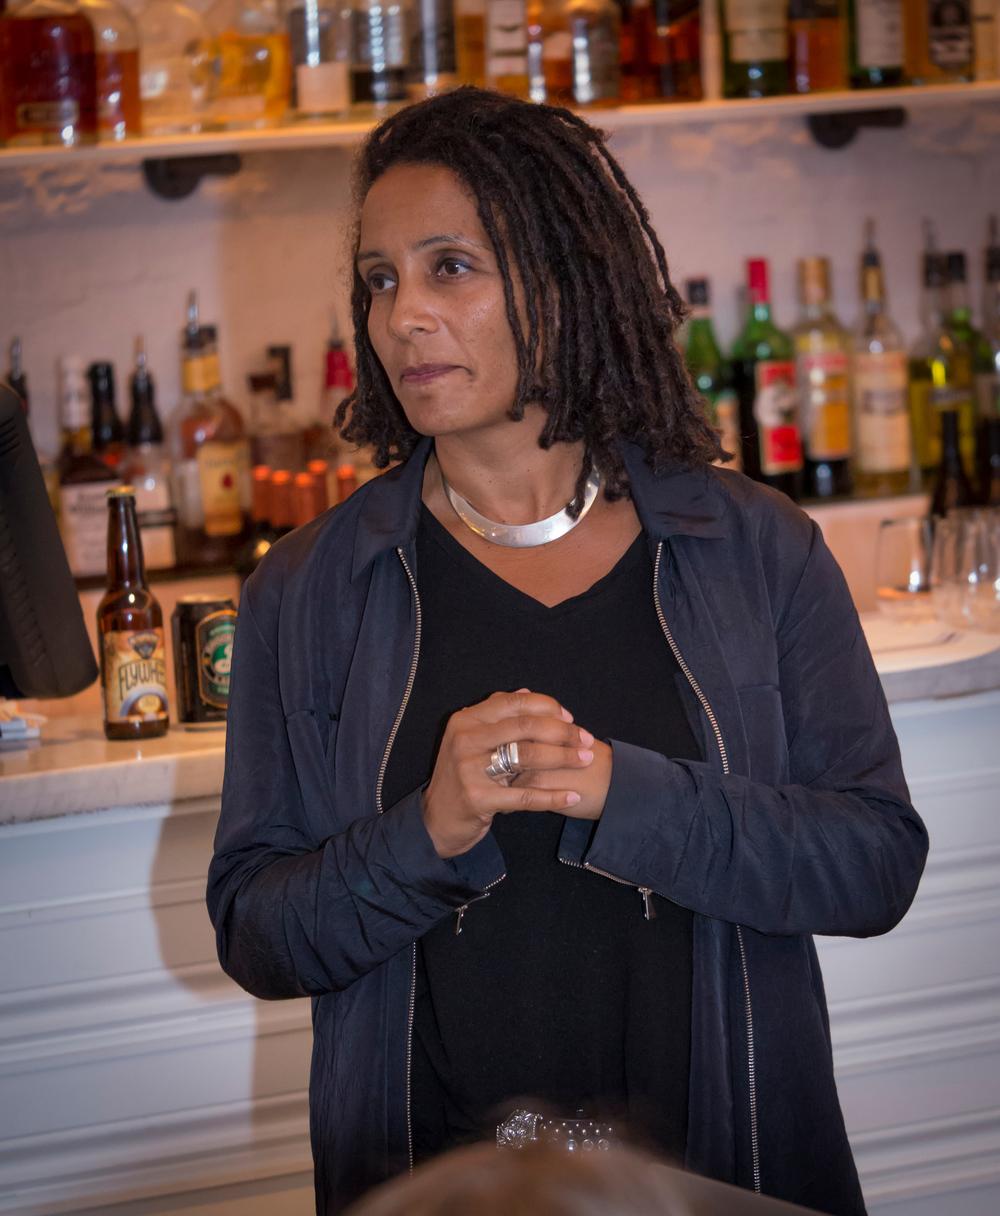 guest speaker Tabitha Jackson, Director of the Documentary Film Program at the Sundance Institute